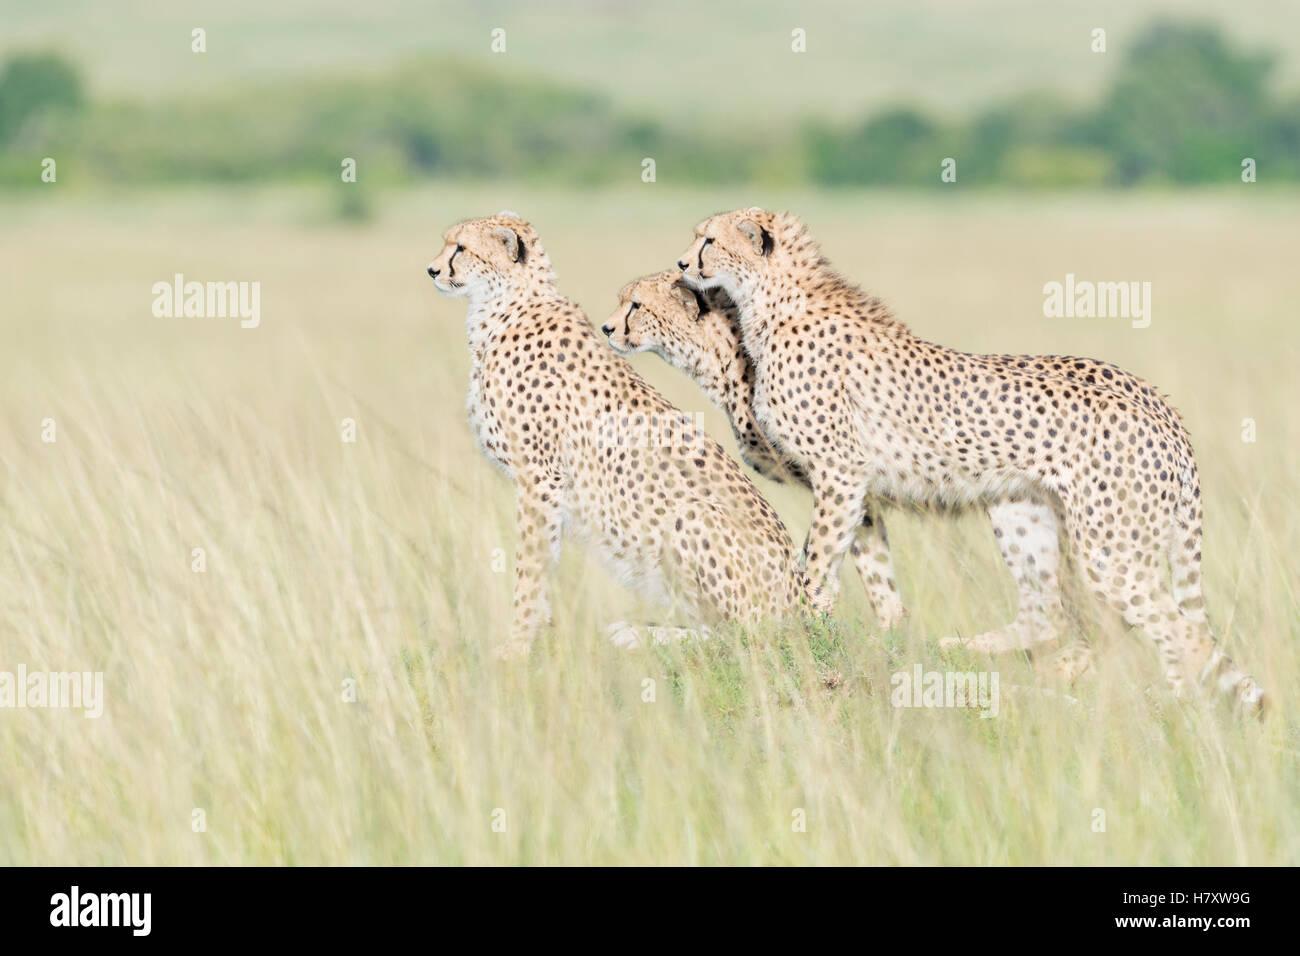 Three Cheetah (Acinonix jubatus) standing on the look out at savanna, Maasai Mara National Reserve, Kenya - Stock Image